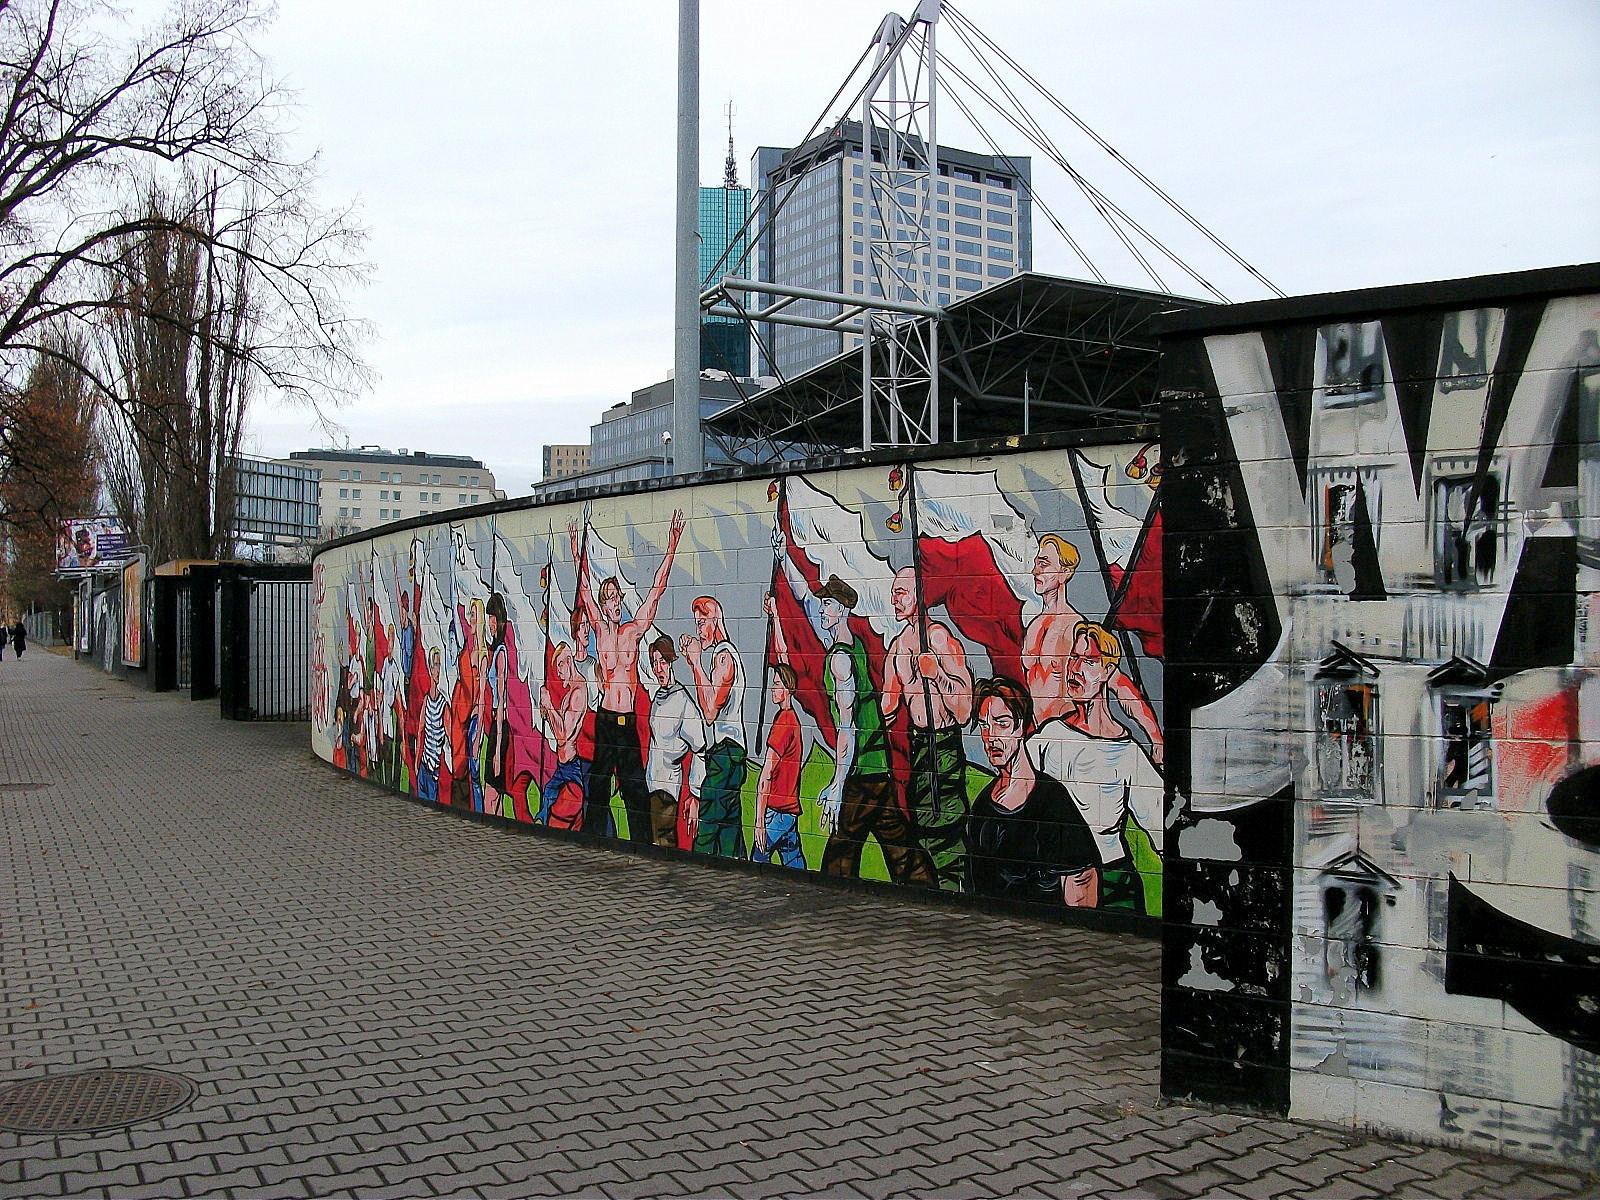 galeria zdj warszawa mural graffiti 44 polska niezwyk a